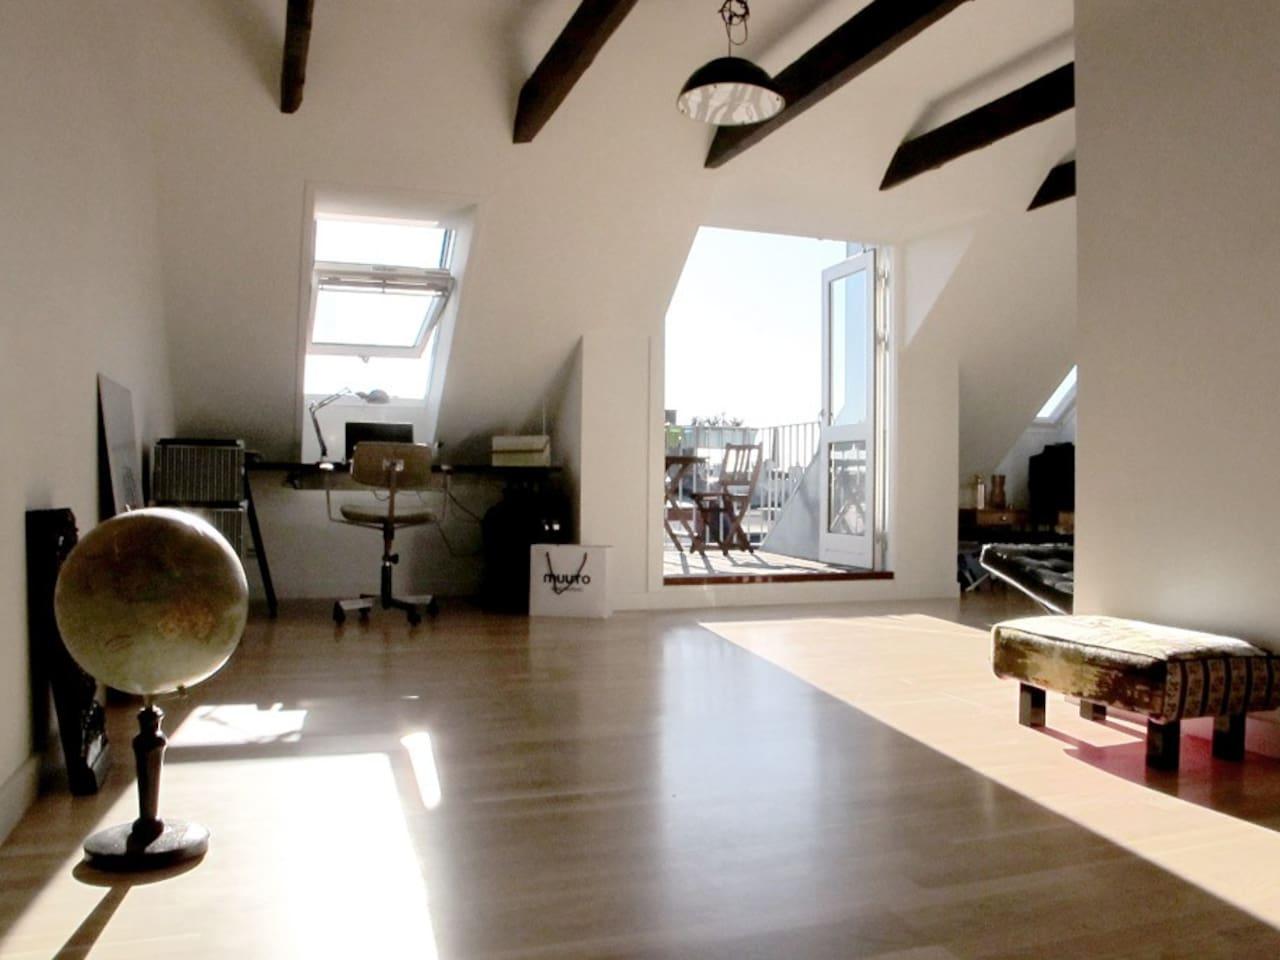 main studio/room